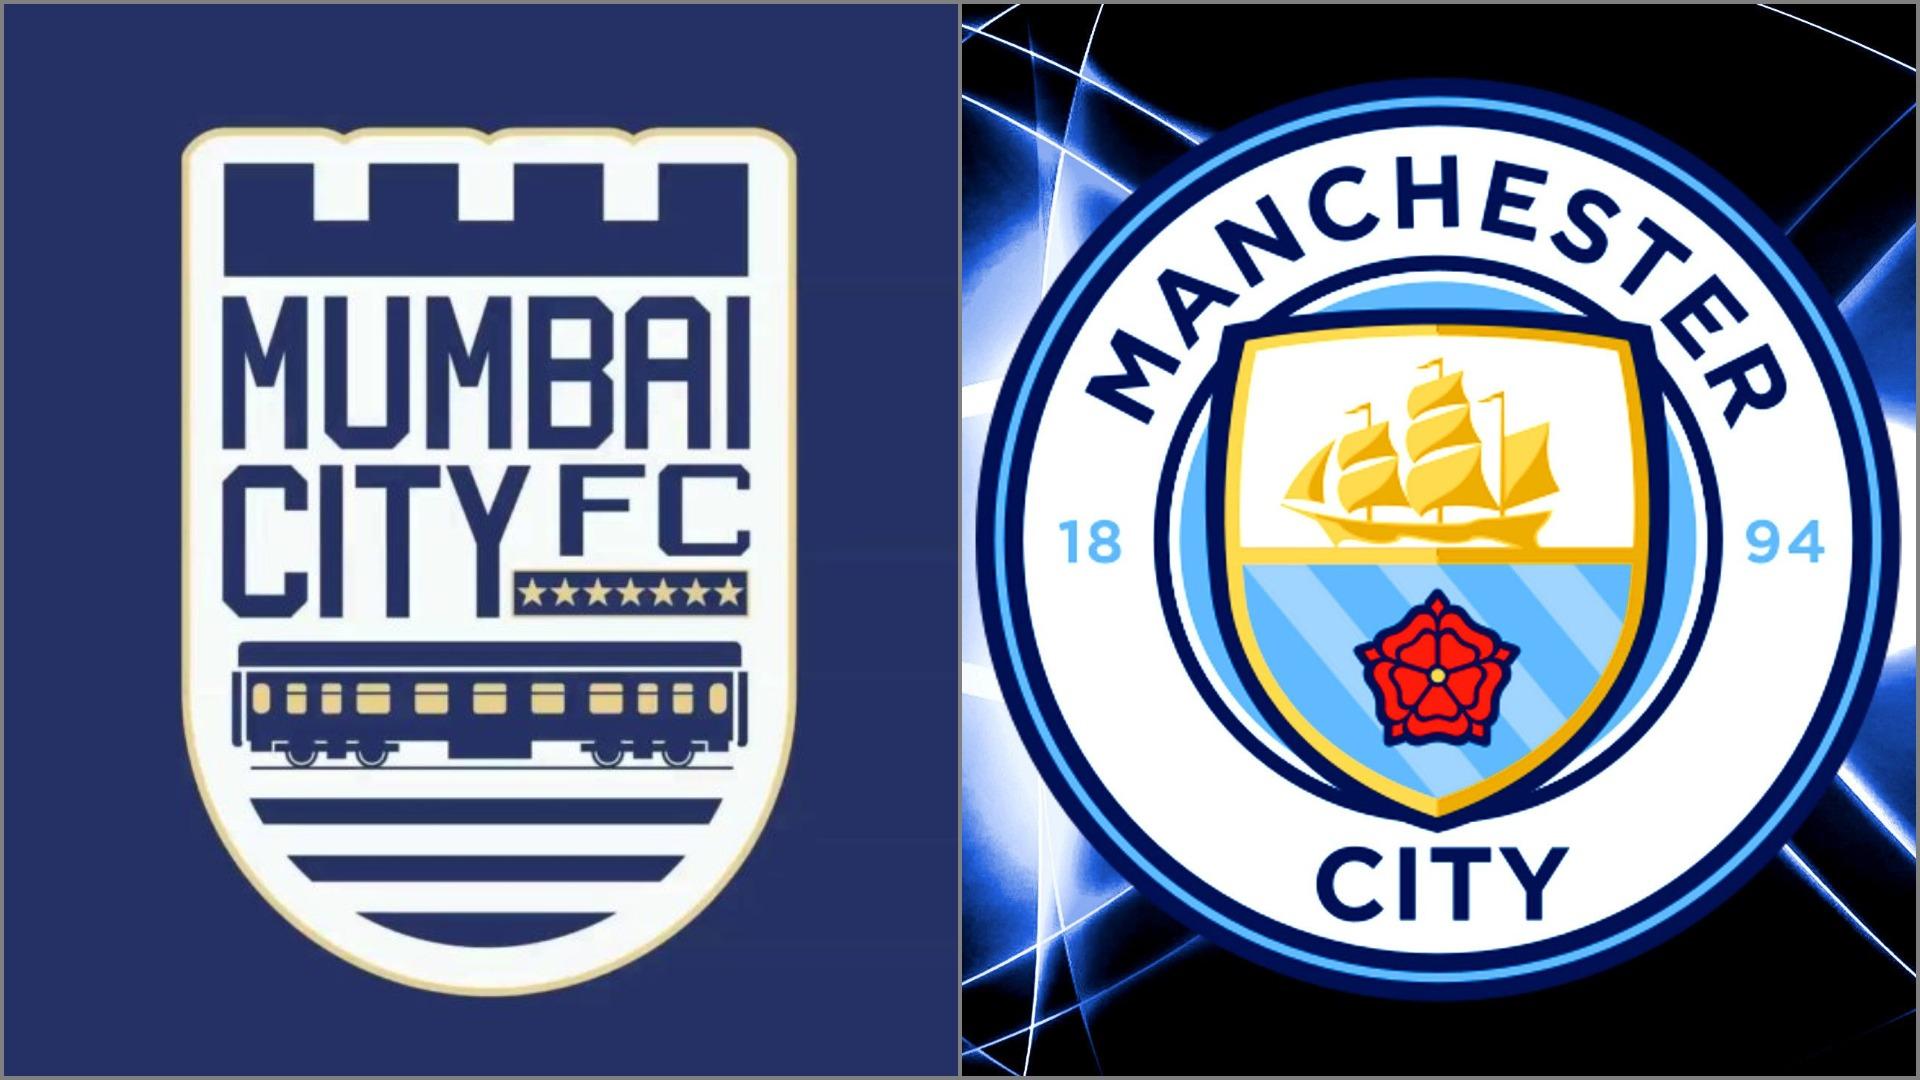 Premier League Champions Manchester City's owners acquire ISL side Mumbai City FC